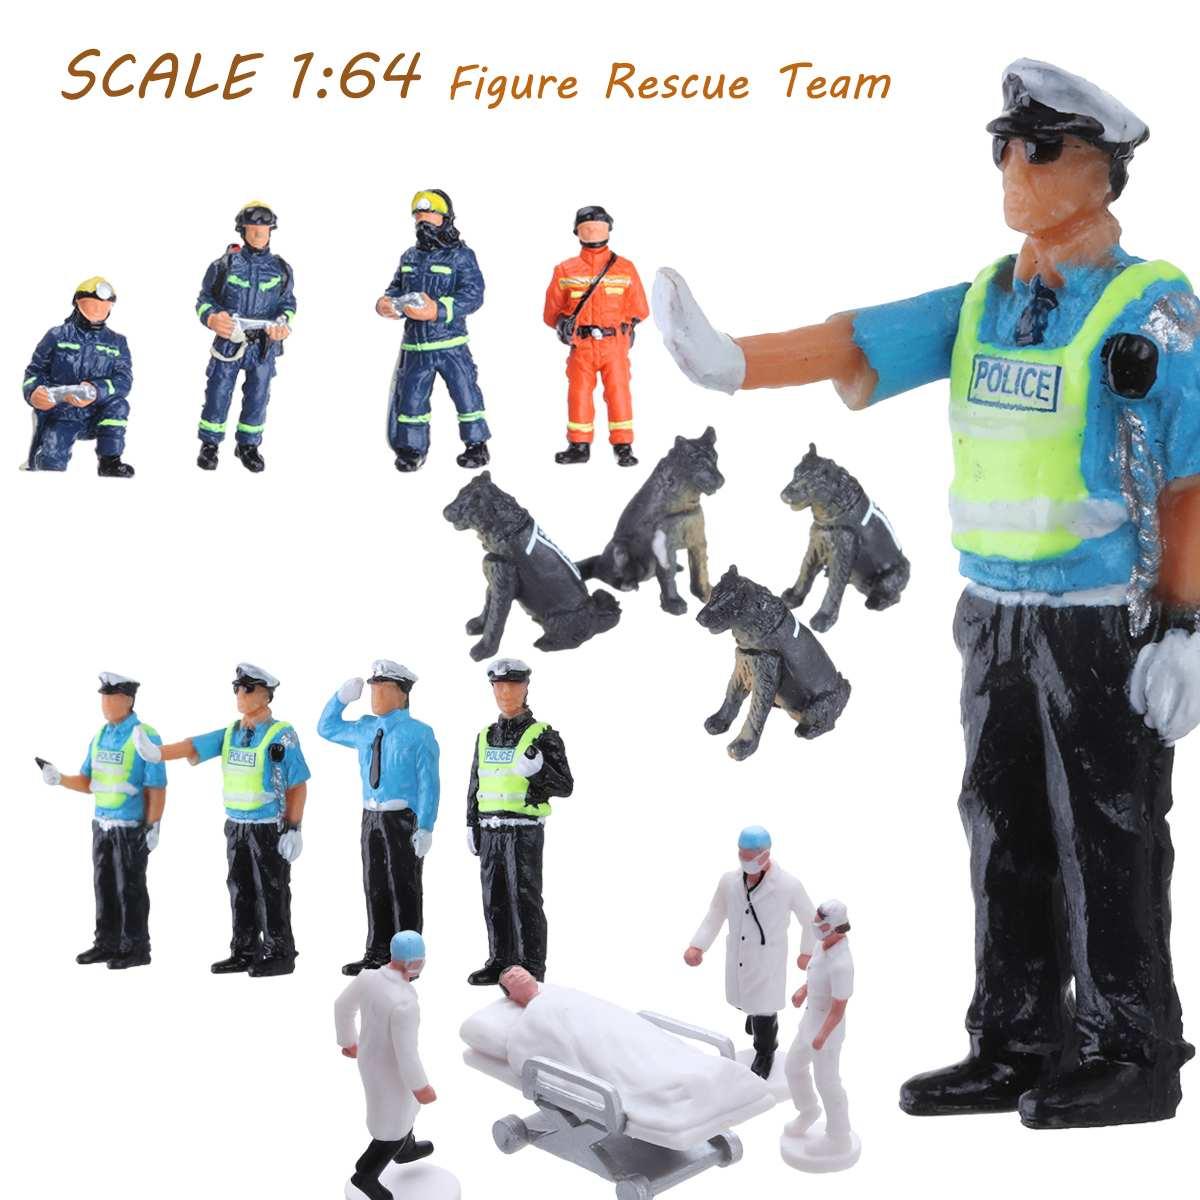 4Pcs/set 1:64 Race Medal Mini Policemen Firemen Rescue Team Dog Figure Model Set For Children Toy Group